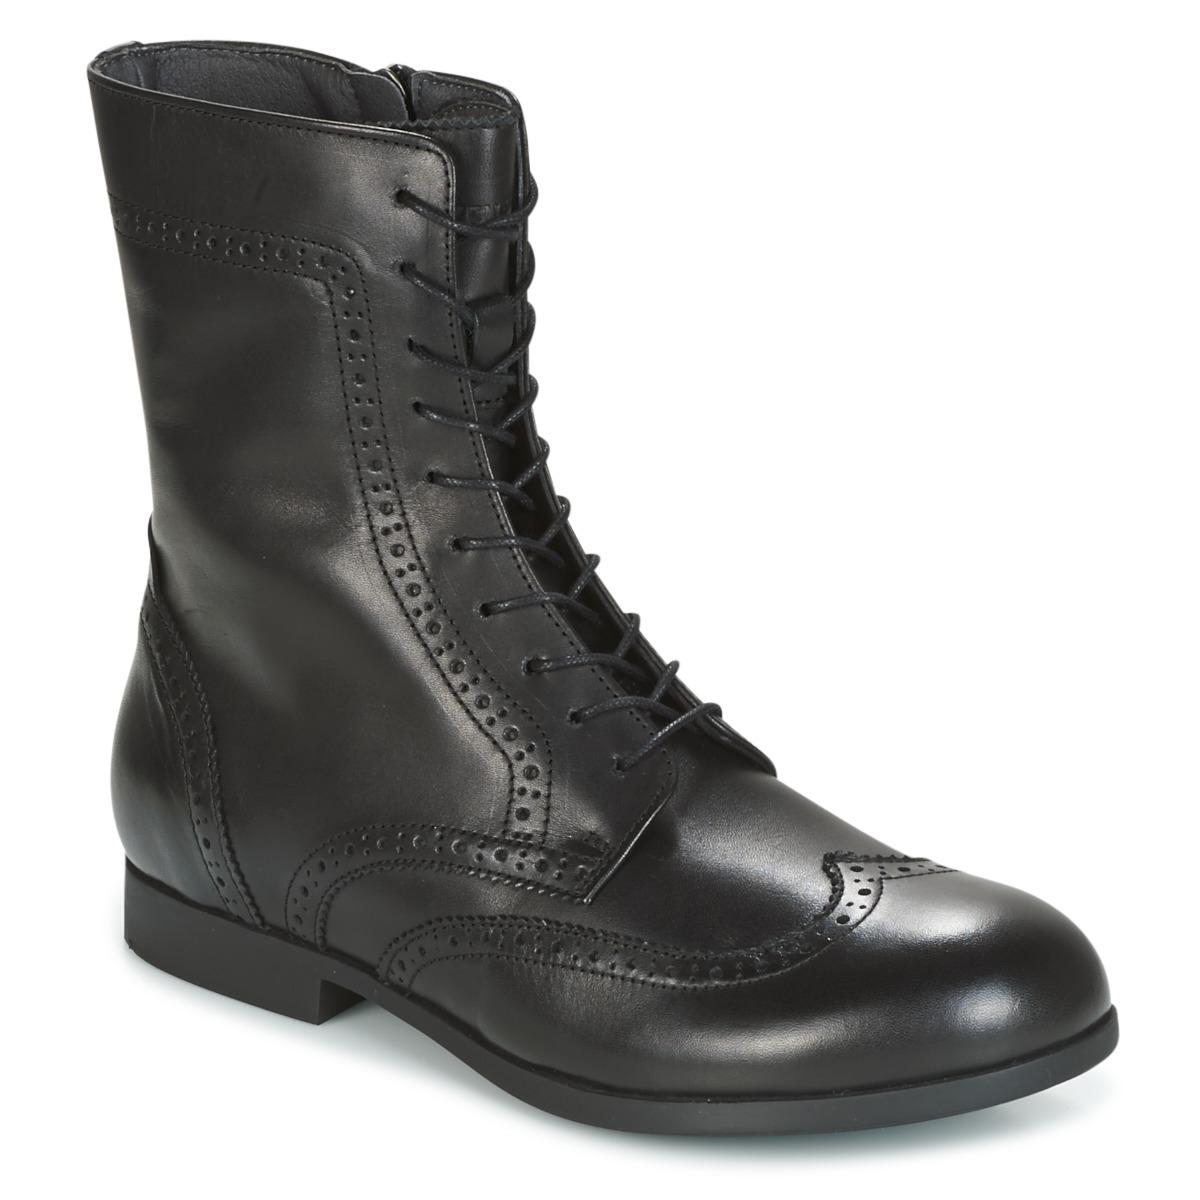 Støvler Birkenstock  LARAMI